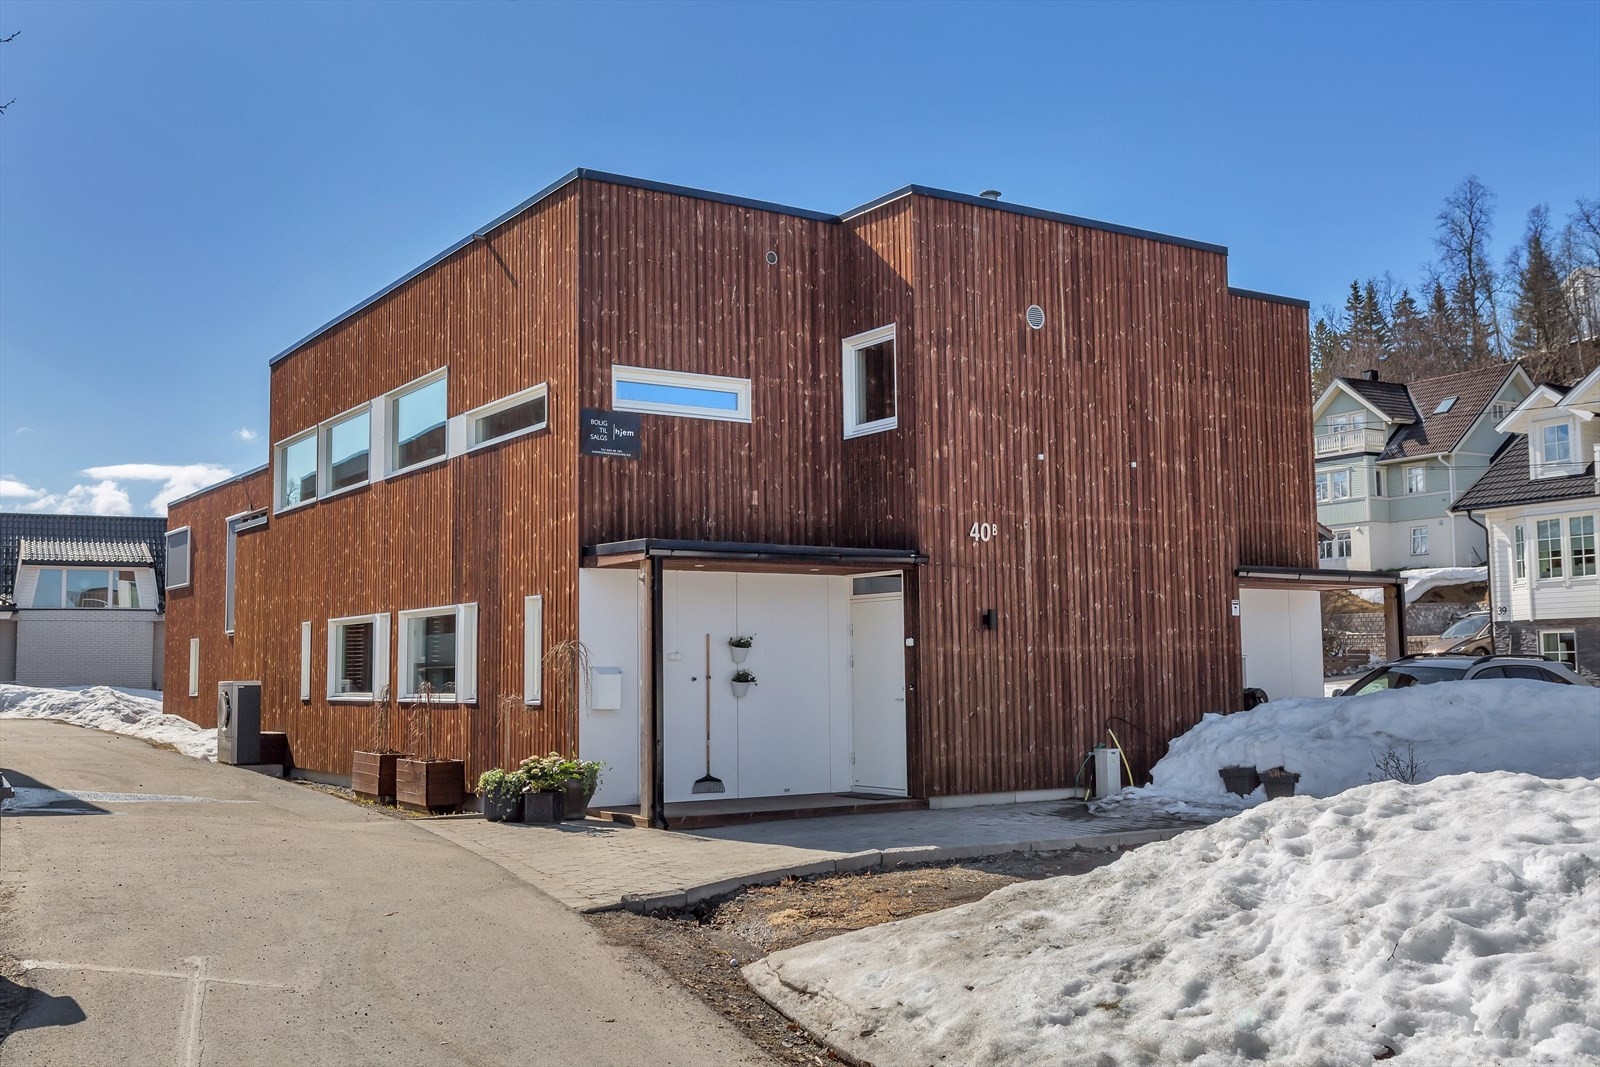 Rektor Qvigstads Gate 40B er en moderne og flott bolig i funkis utførelse